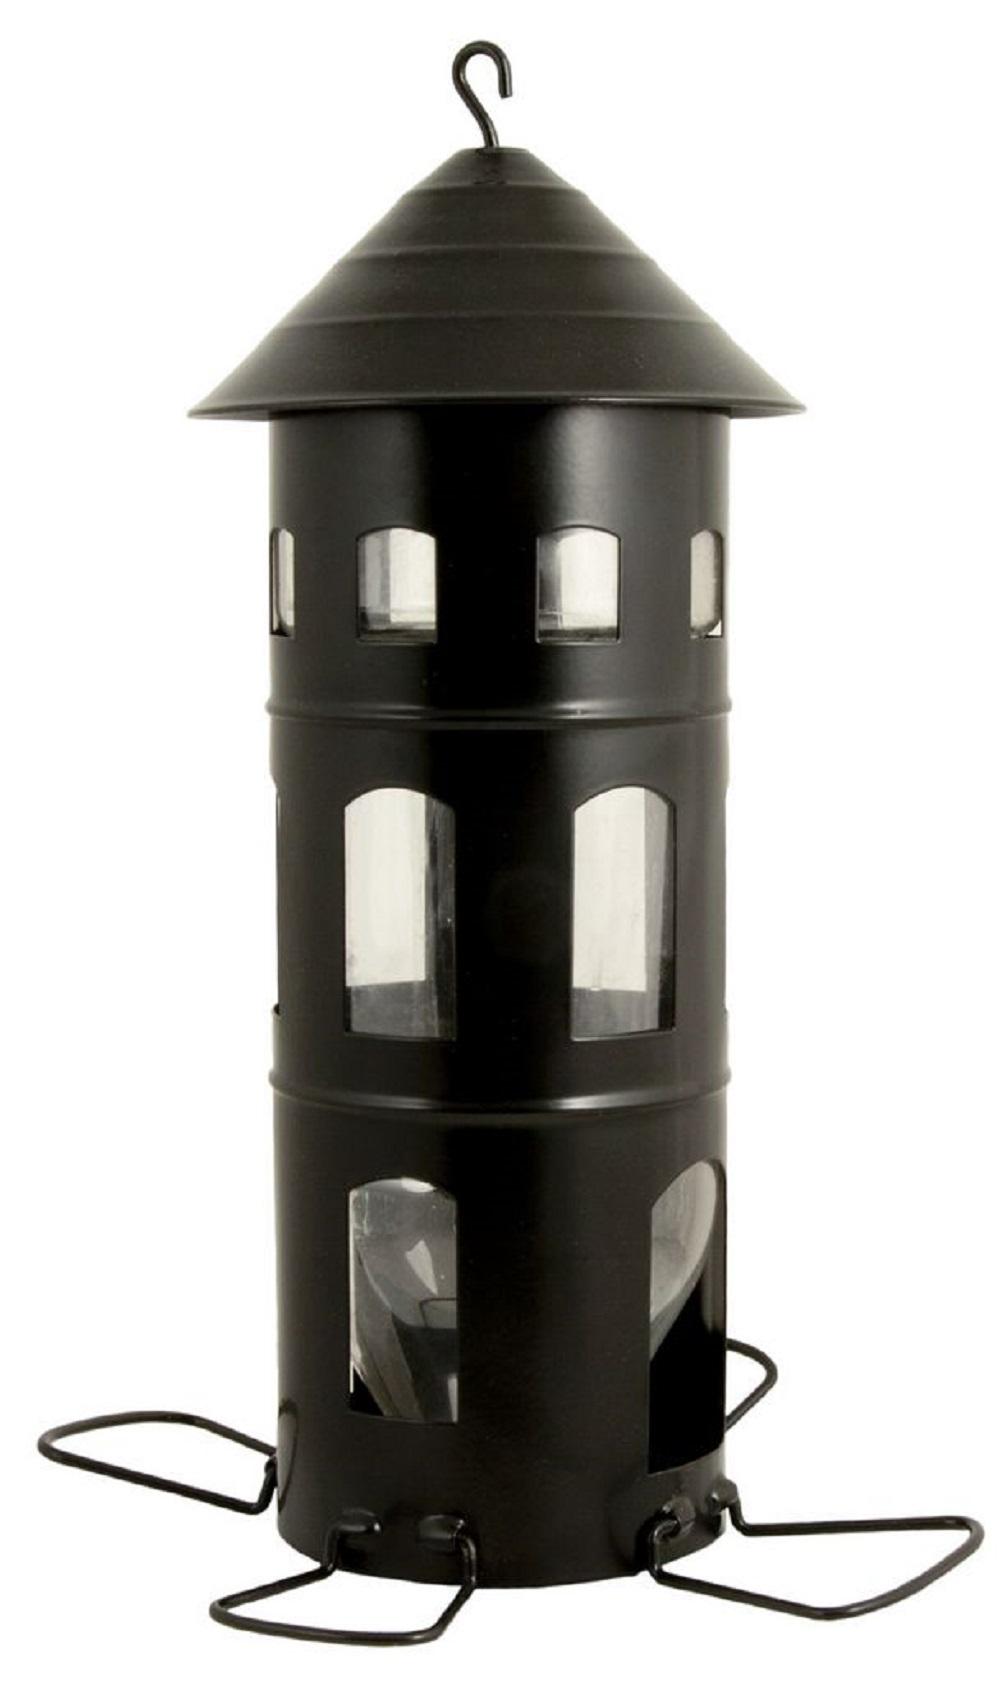 Кормушка Wildlife garden combi feeder Черный кормушка для птиц wildlife garden nuts wg321 black